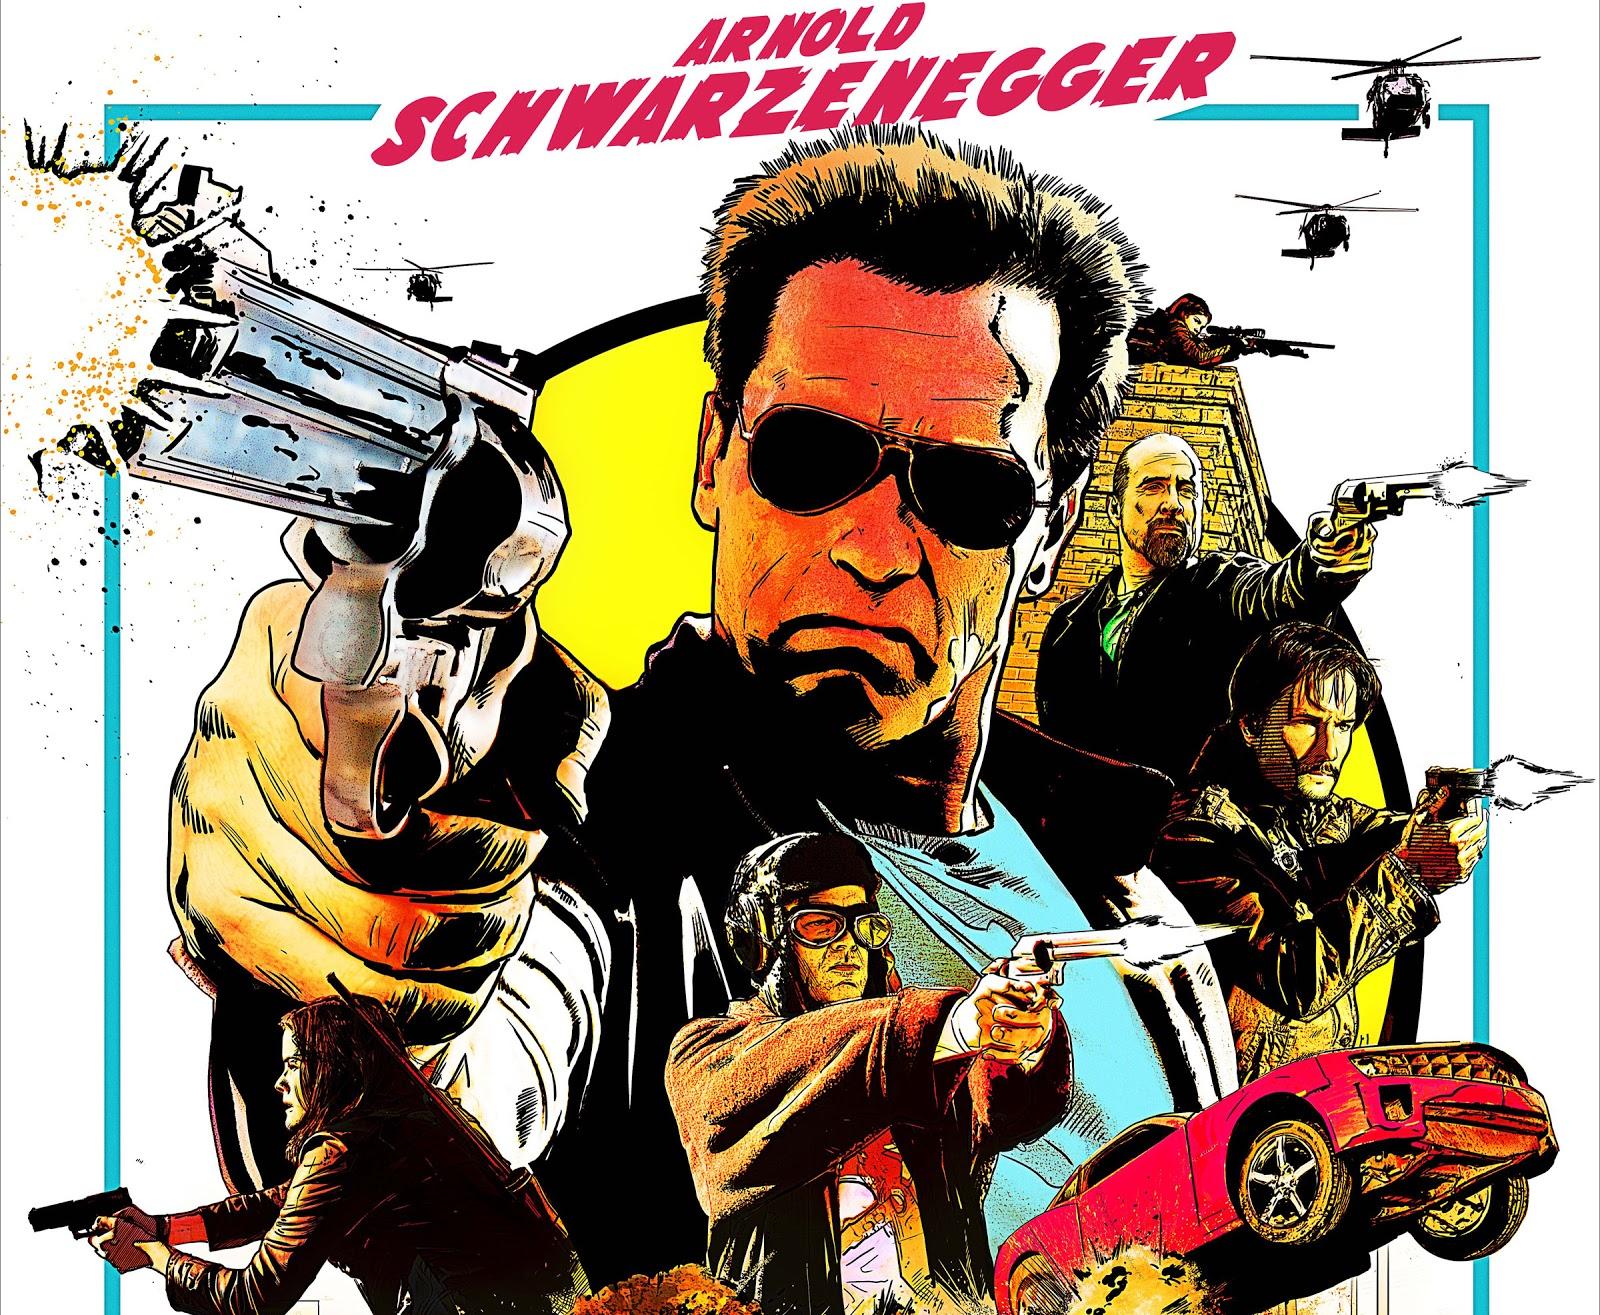 http://3.bp.blogspot.com/-zCnlqIq0ocA/UMs6z2HVr0I/AAAAAAAAQp4/VQnm9EEgdio/s1600/The_Last_Stand_I+Saw+The+Devil_the_last_stand_Arnold_Schwarzenegger_Johnny_Knoxville_Kim_Ji_Woon.jpg